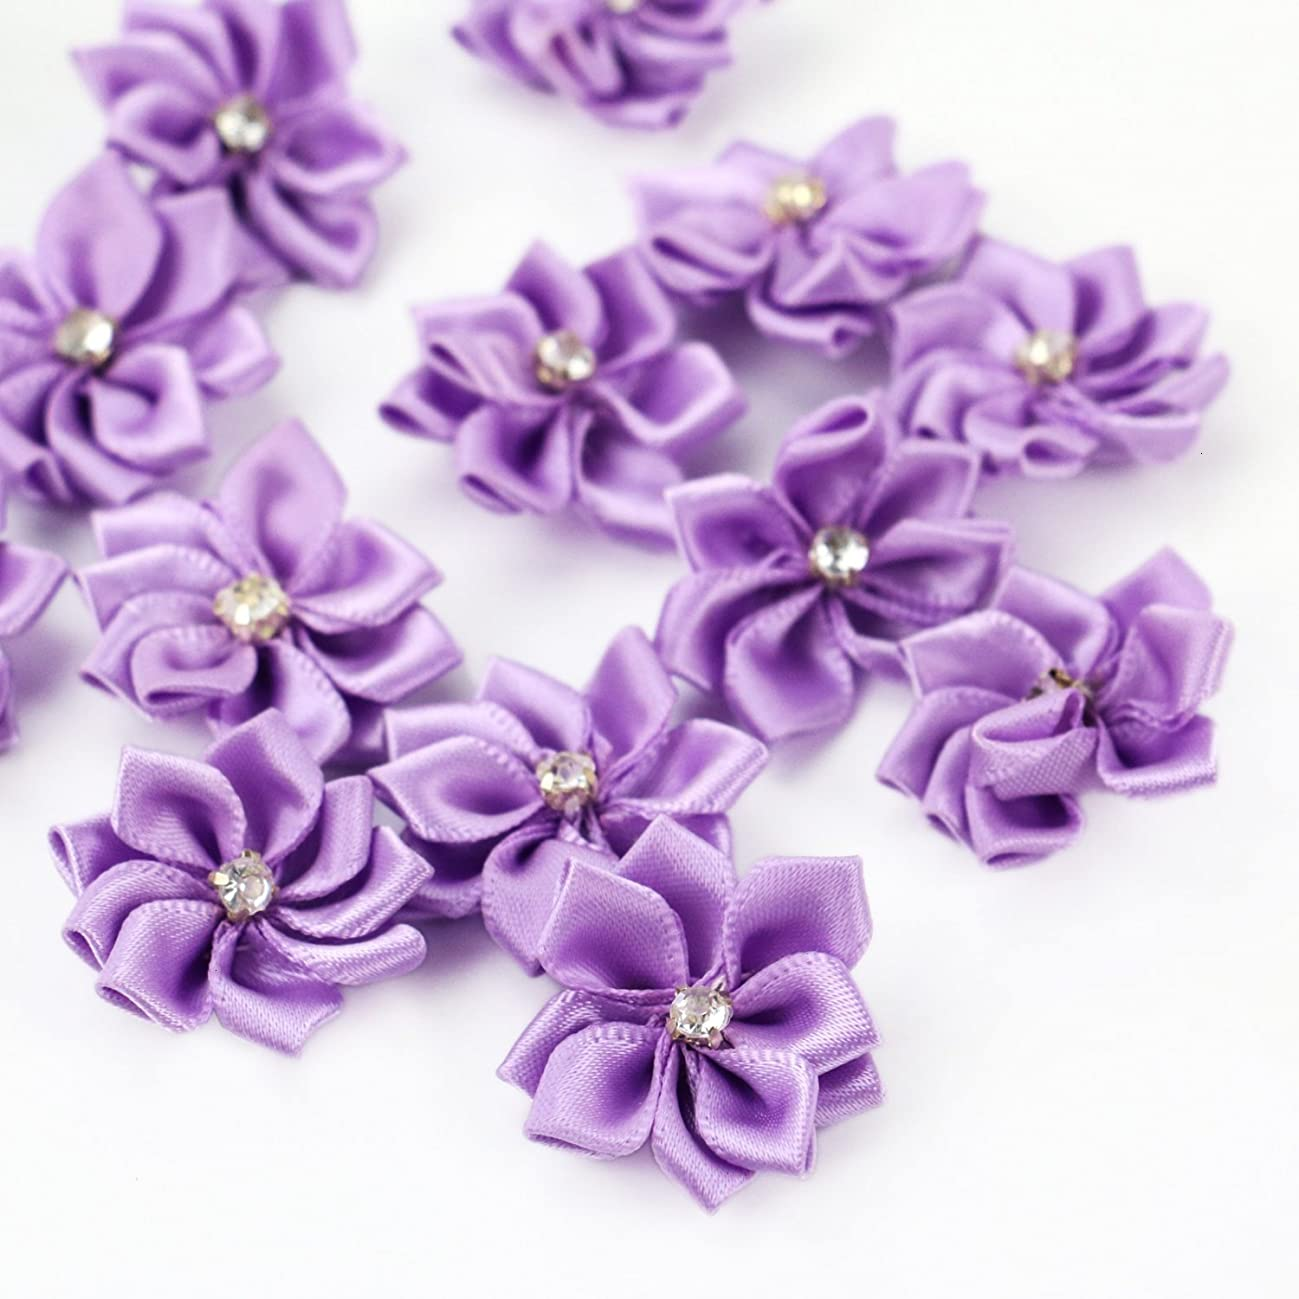 HUELE 40pcs 20mm Purple Satin Ribbon Flowers Bows Rhinestone Wedding Ornament Appliques